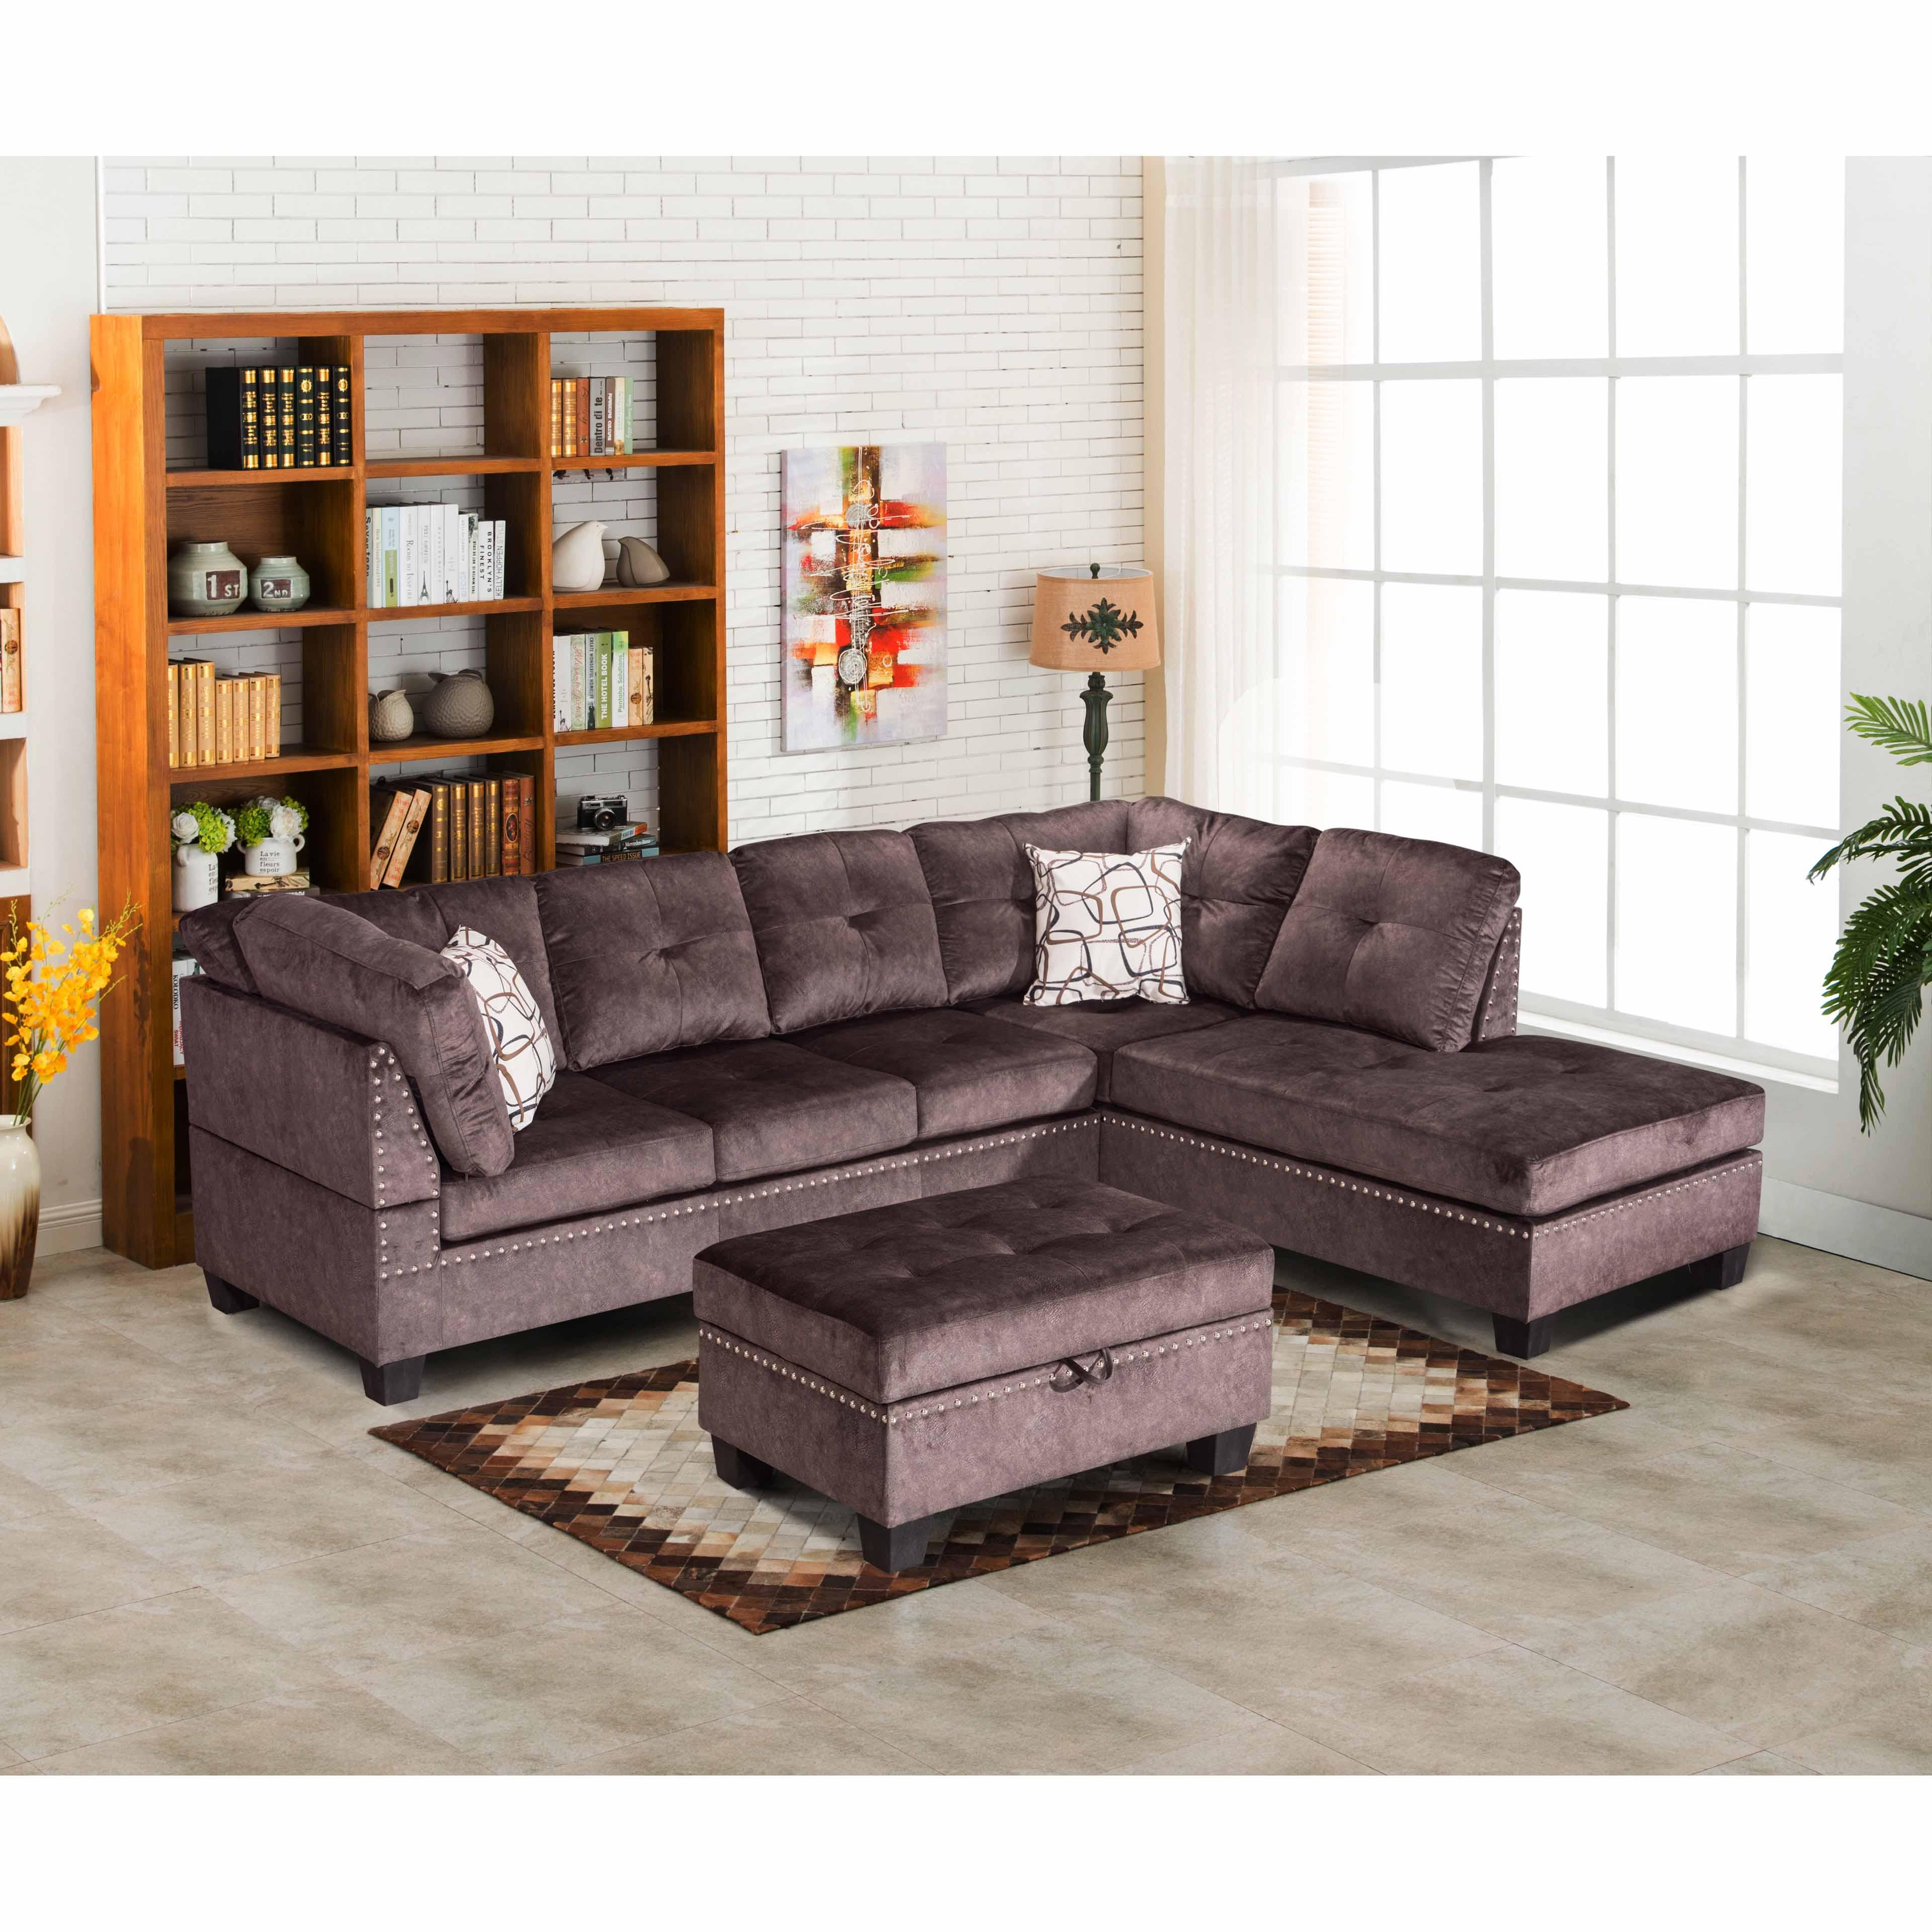 Latest Design Hot Trending High Quality Sectional Corner Sofa Fabric Sofa  Set For Living Room - Buy L Shaped Sofa,Leather Corner Sofa,Modern Corner  ...